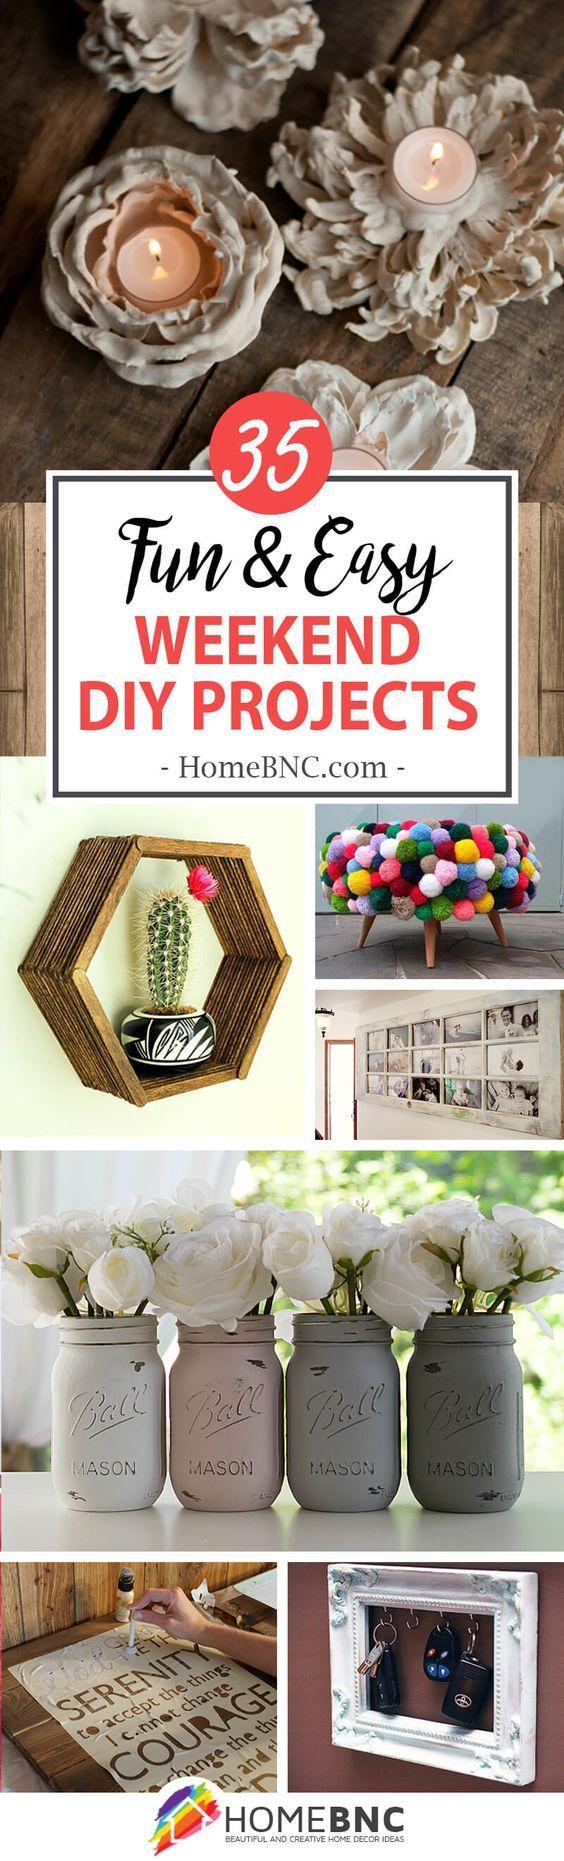 Weekend DIY Home Decor Project Ideas DIY home decor